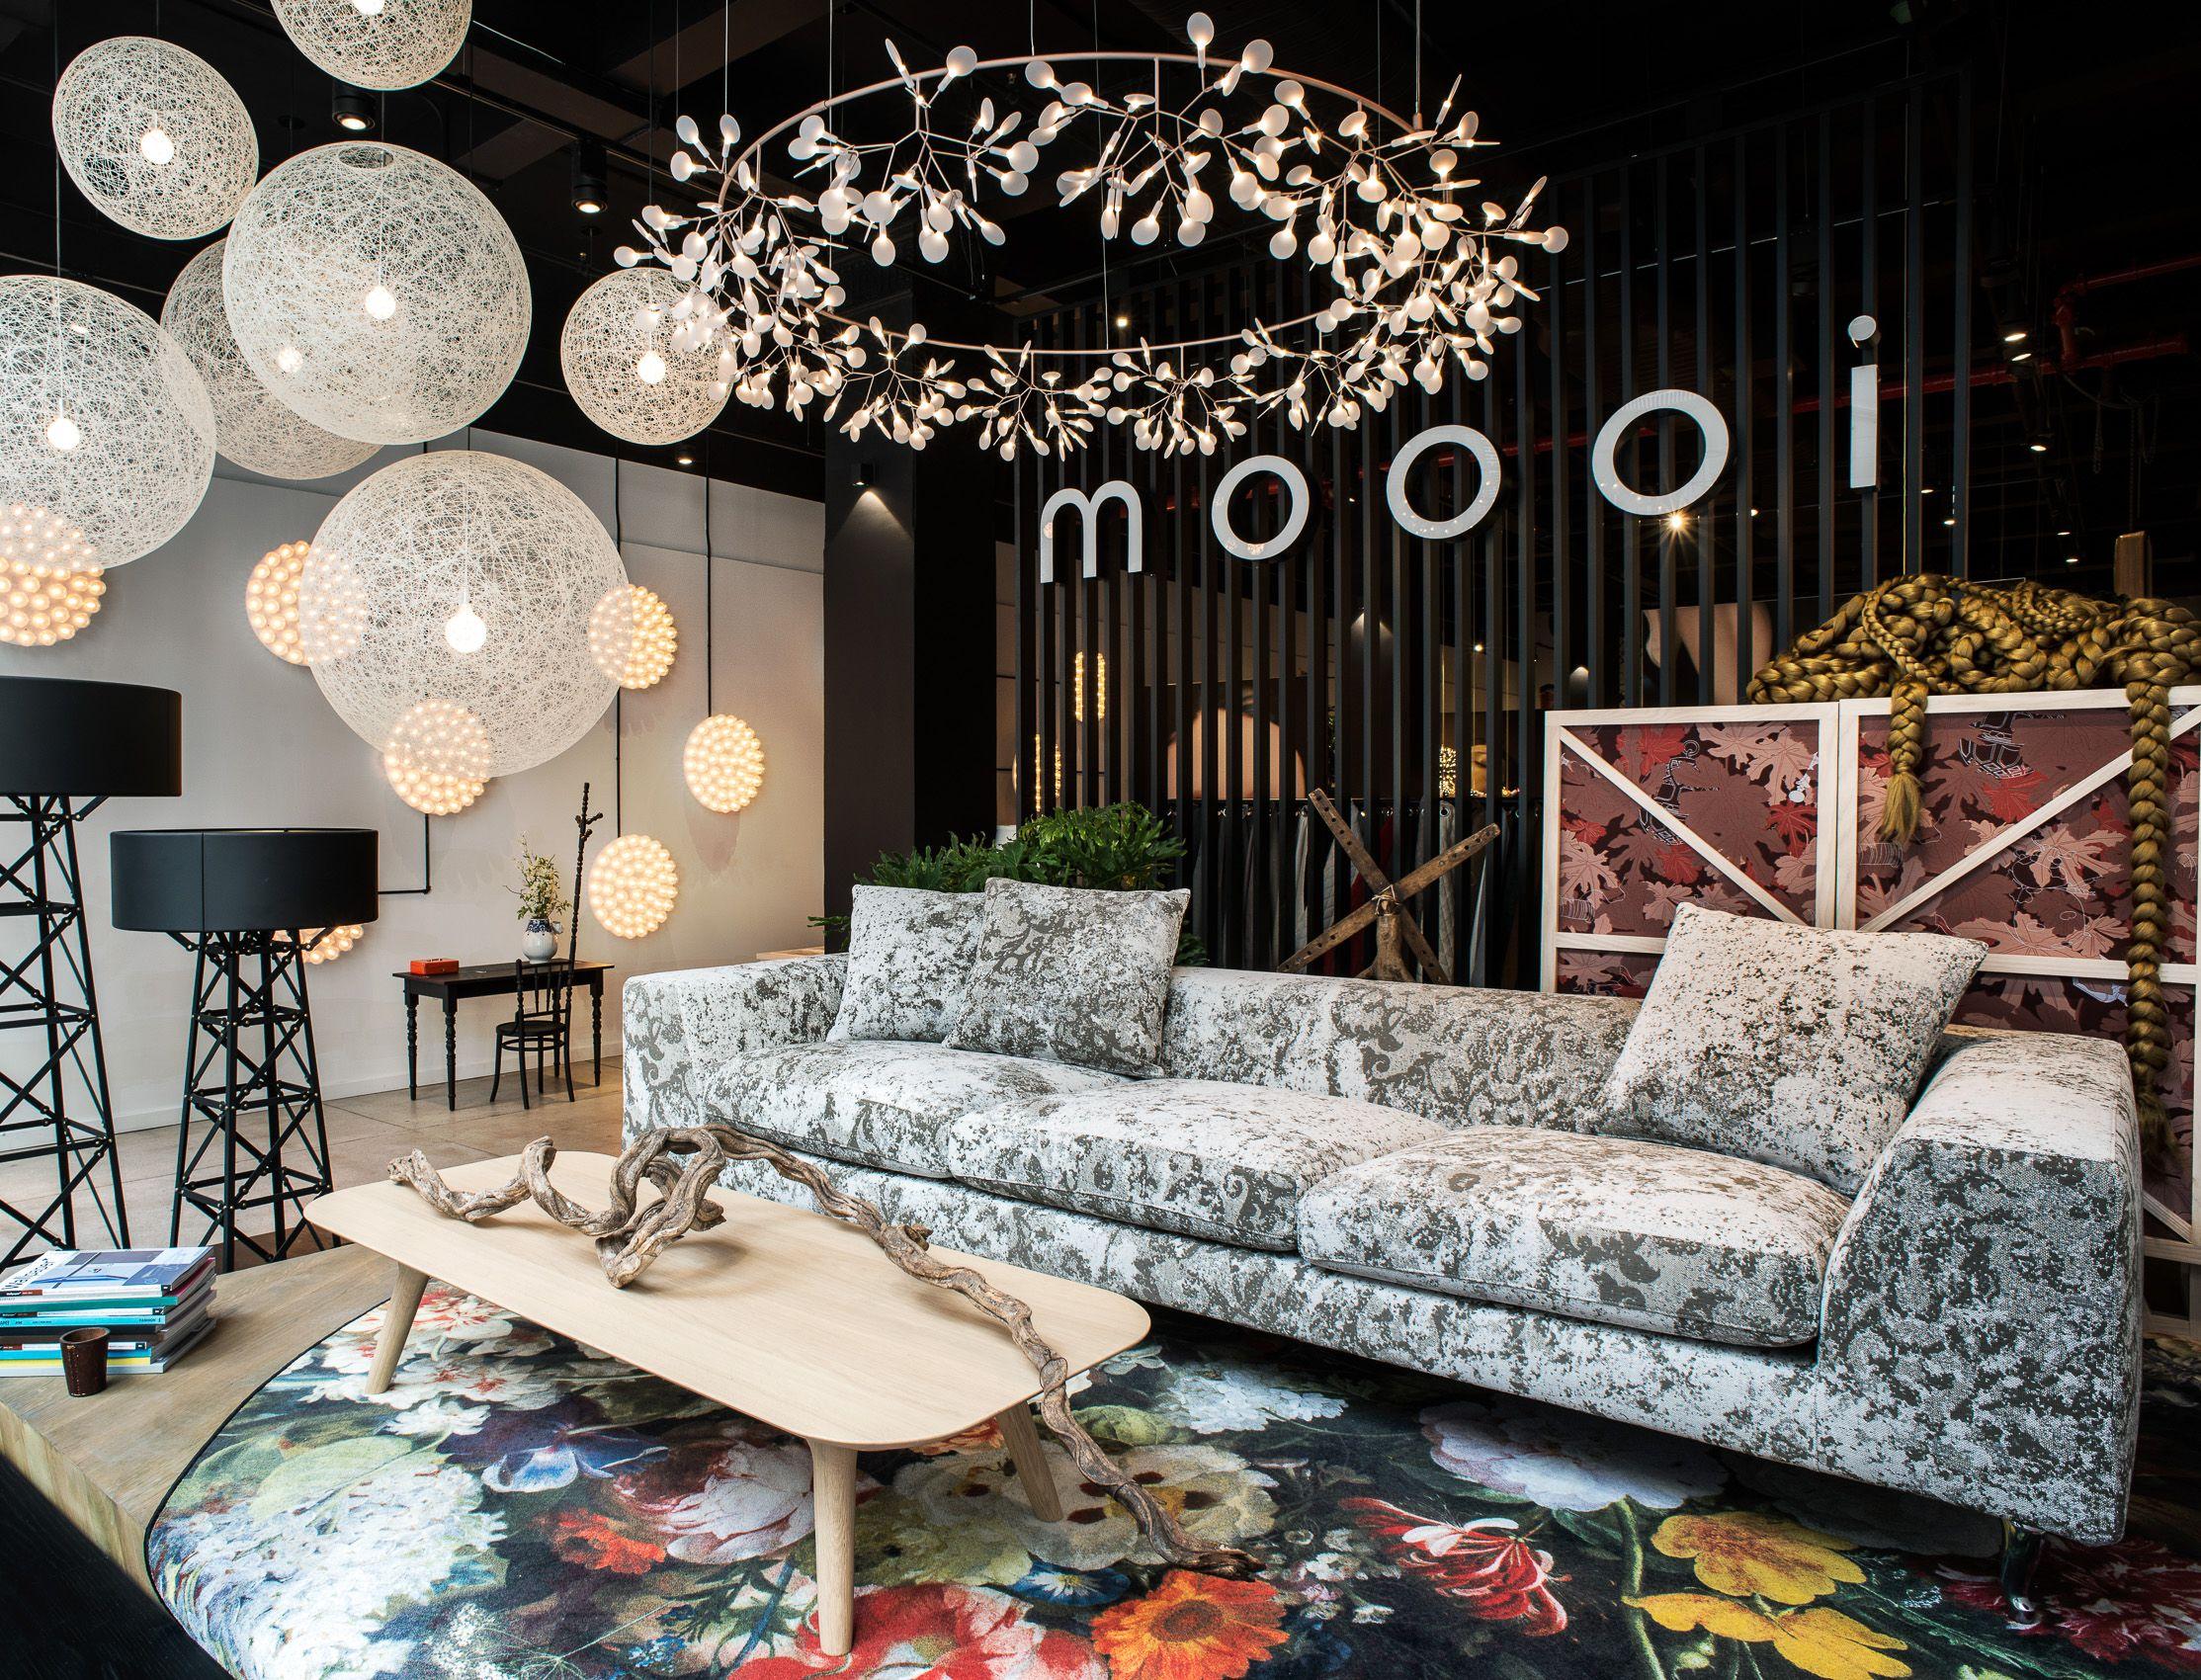 Moooi lighting Design Sources Lighting Pinterest